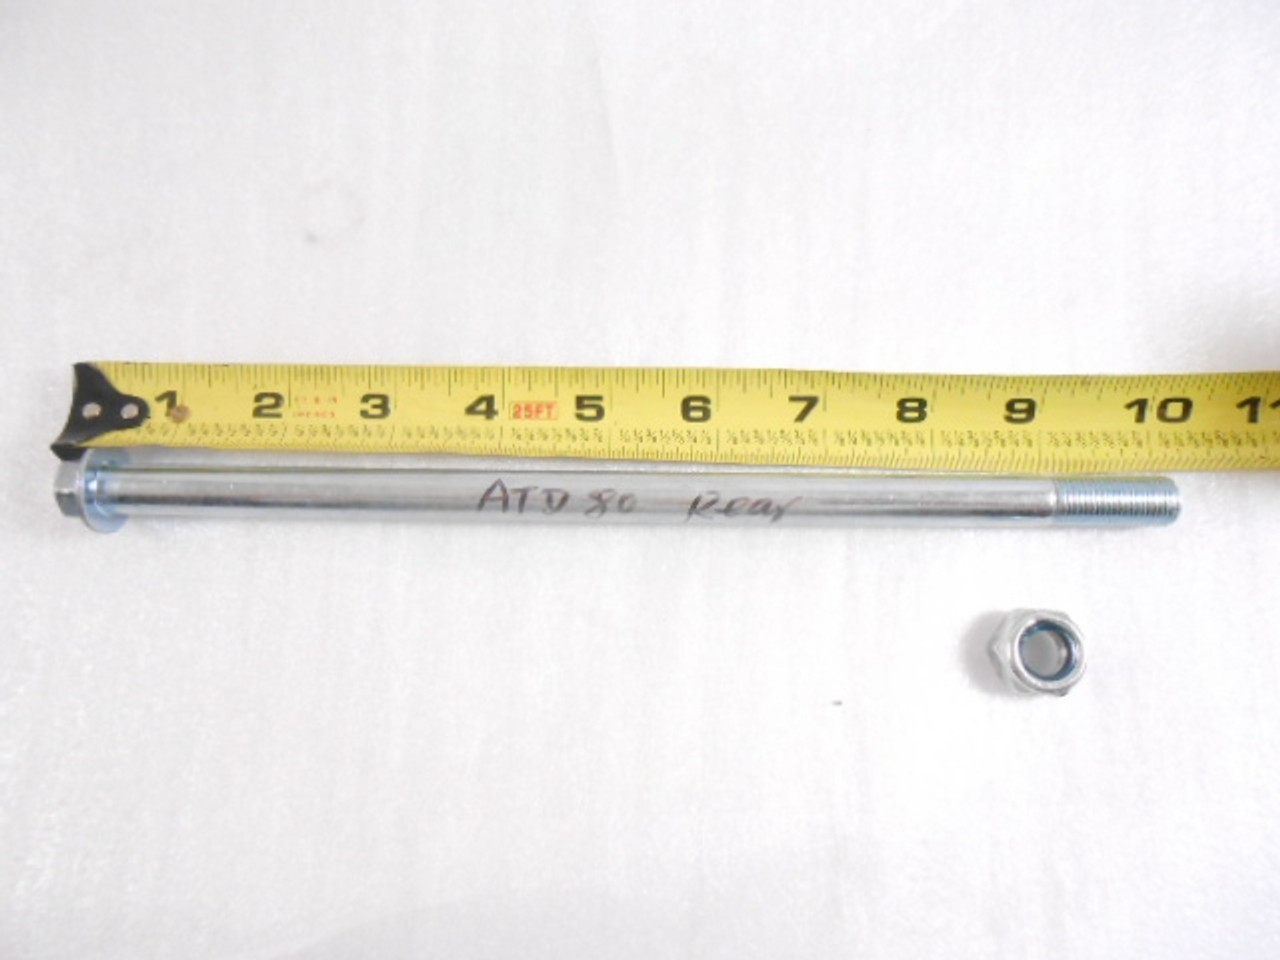 AXLE (REAR) 14045-A225-13